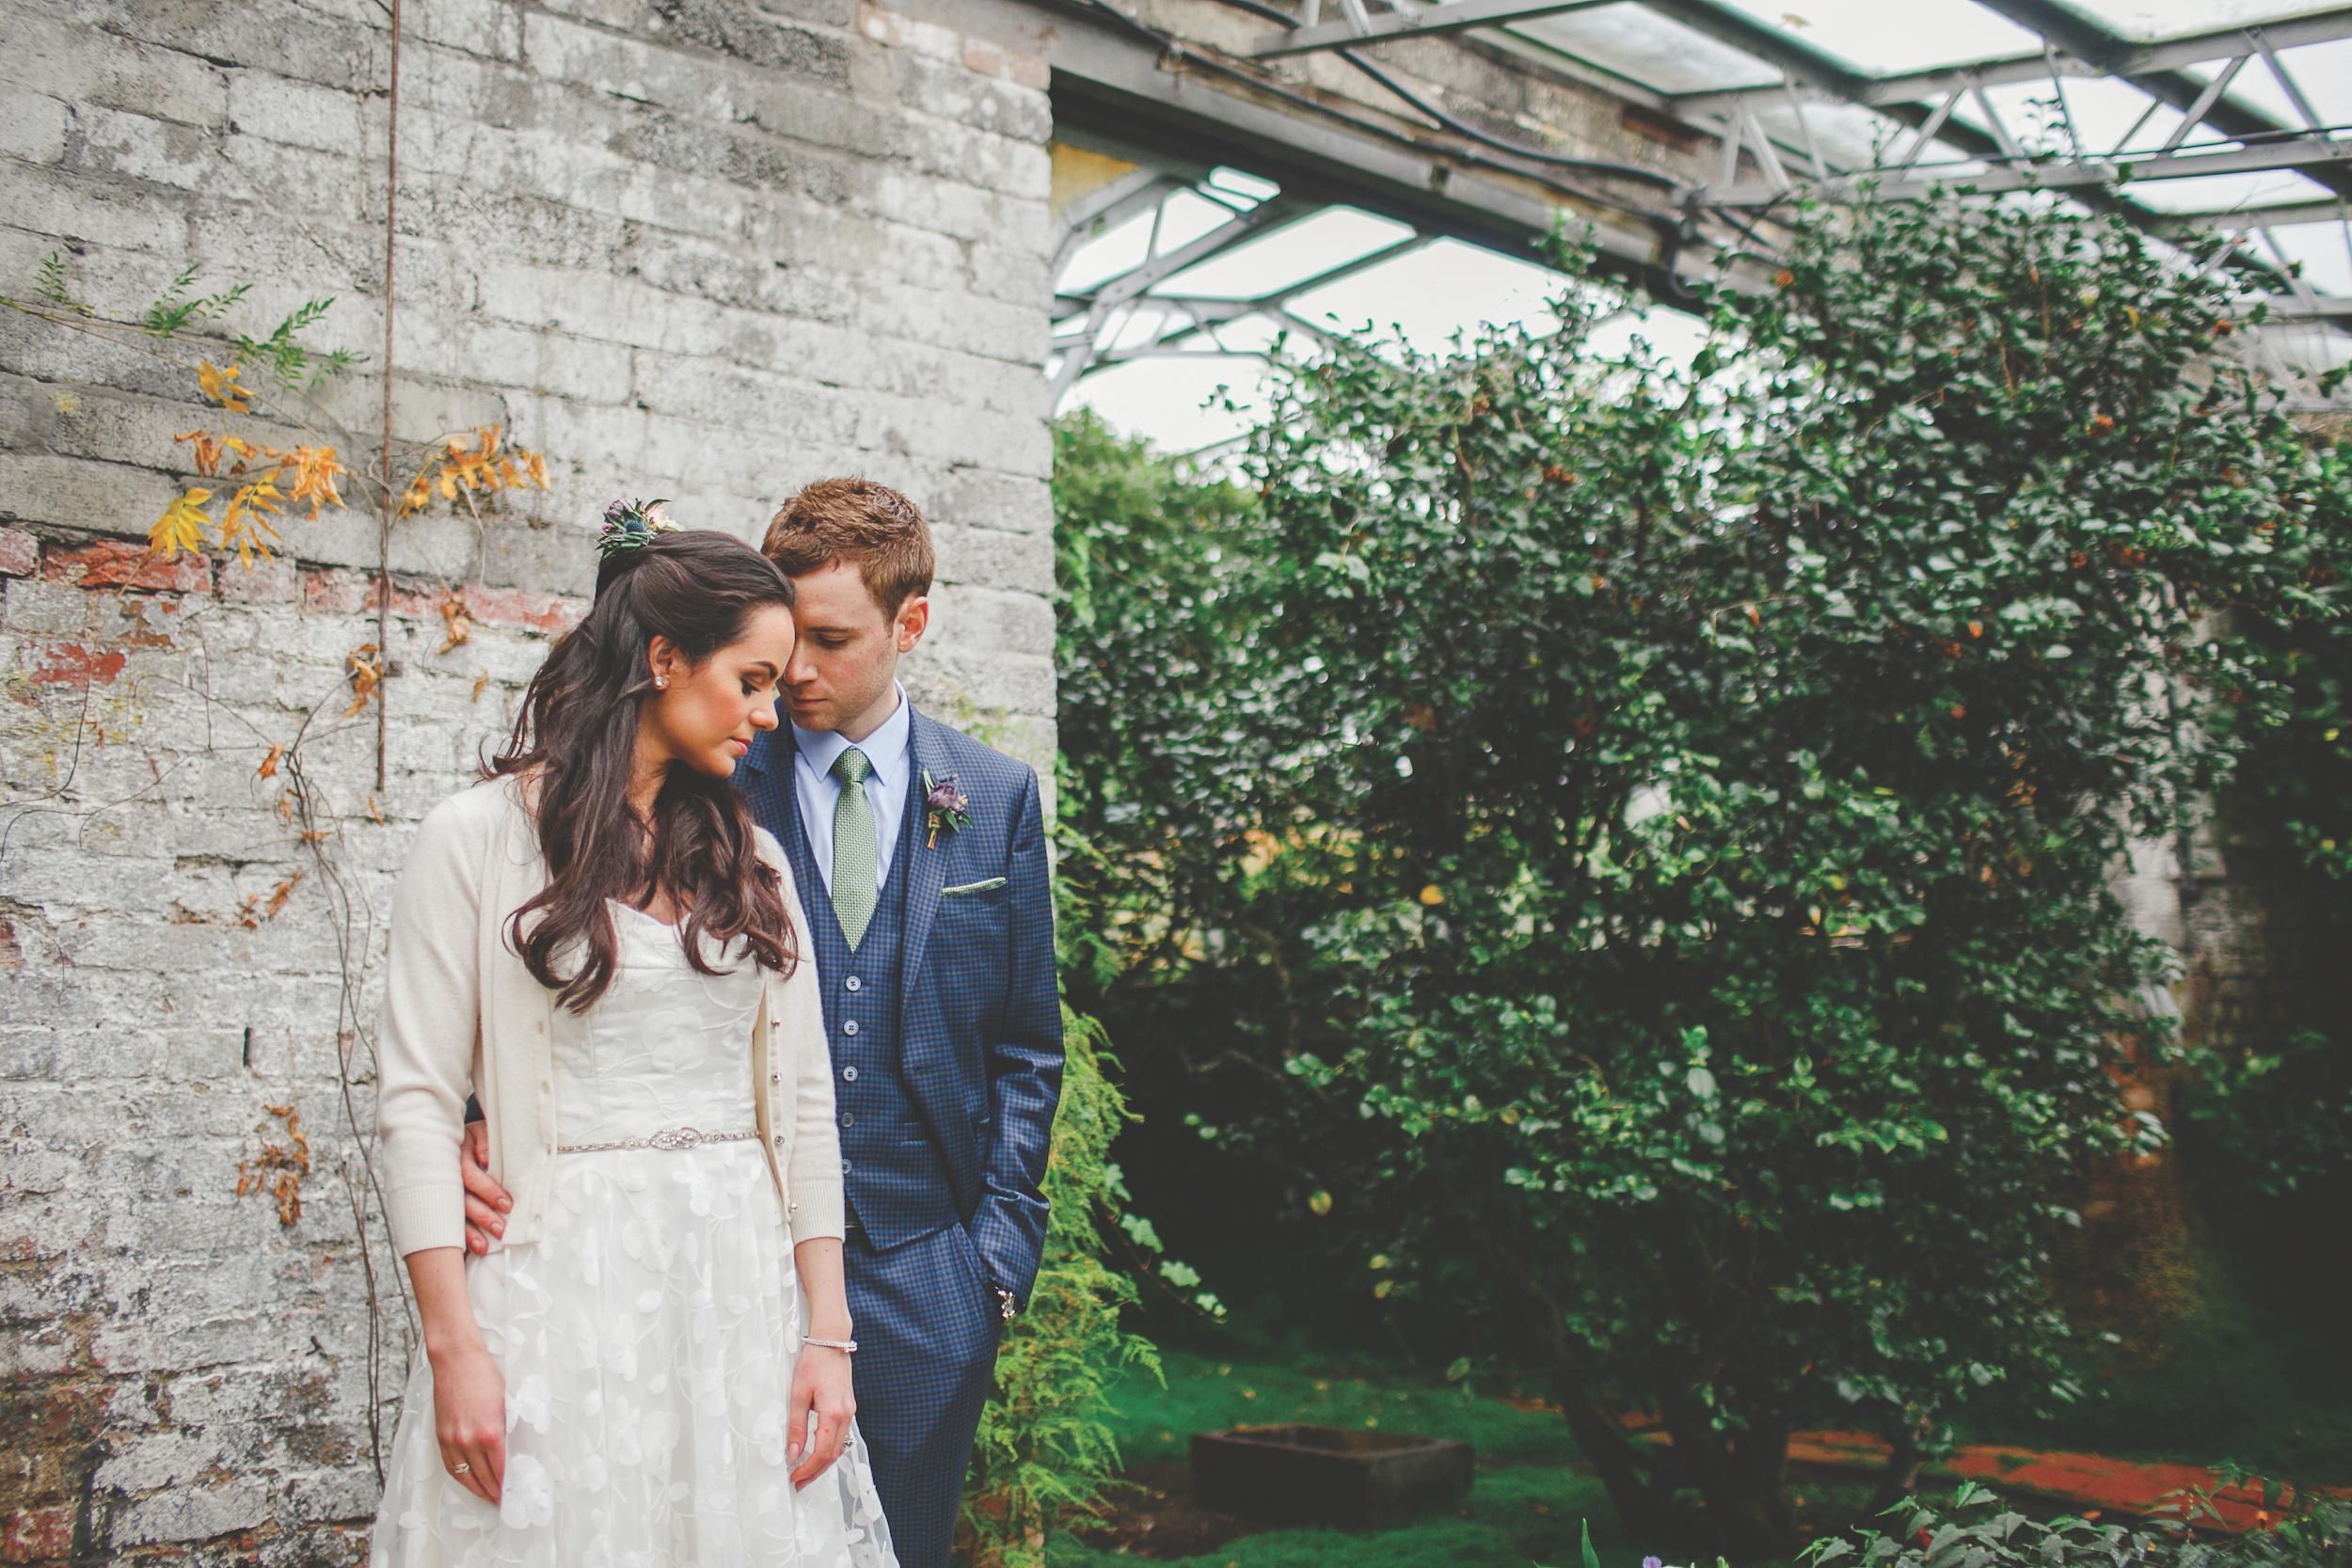 gather_and_tides_wedding_photographer_larchfield_autumn_northern_ireland_Wedding_inspire_Weddings_9.jpg